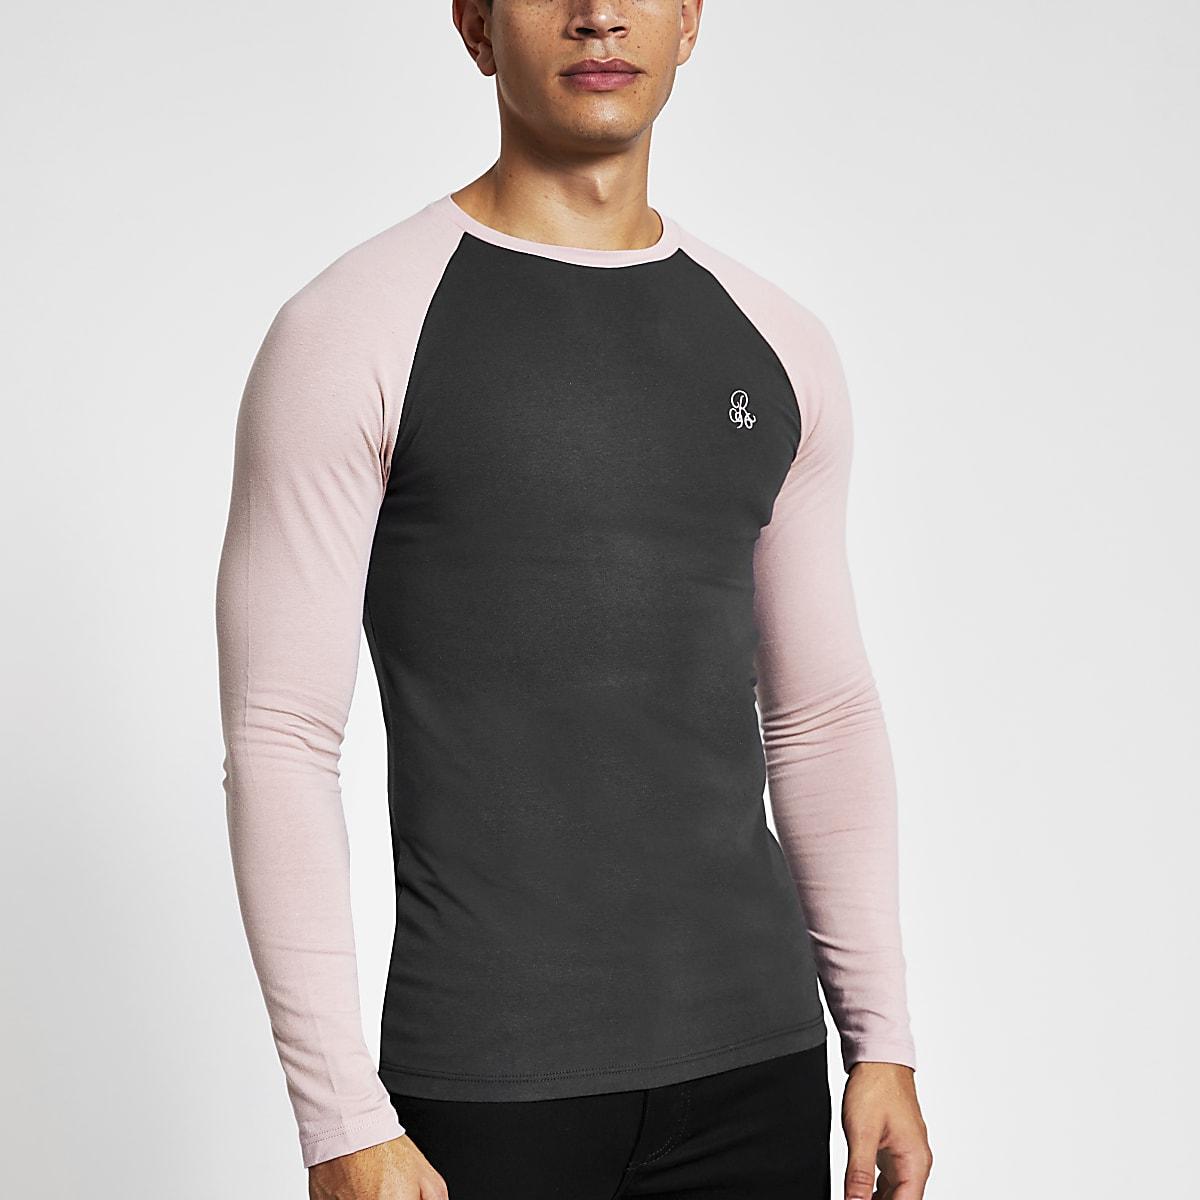 T-shirt ajusté grisR96 à manches raglan